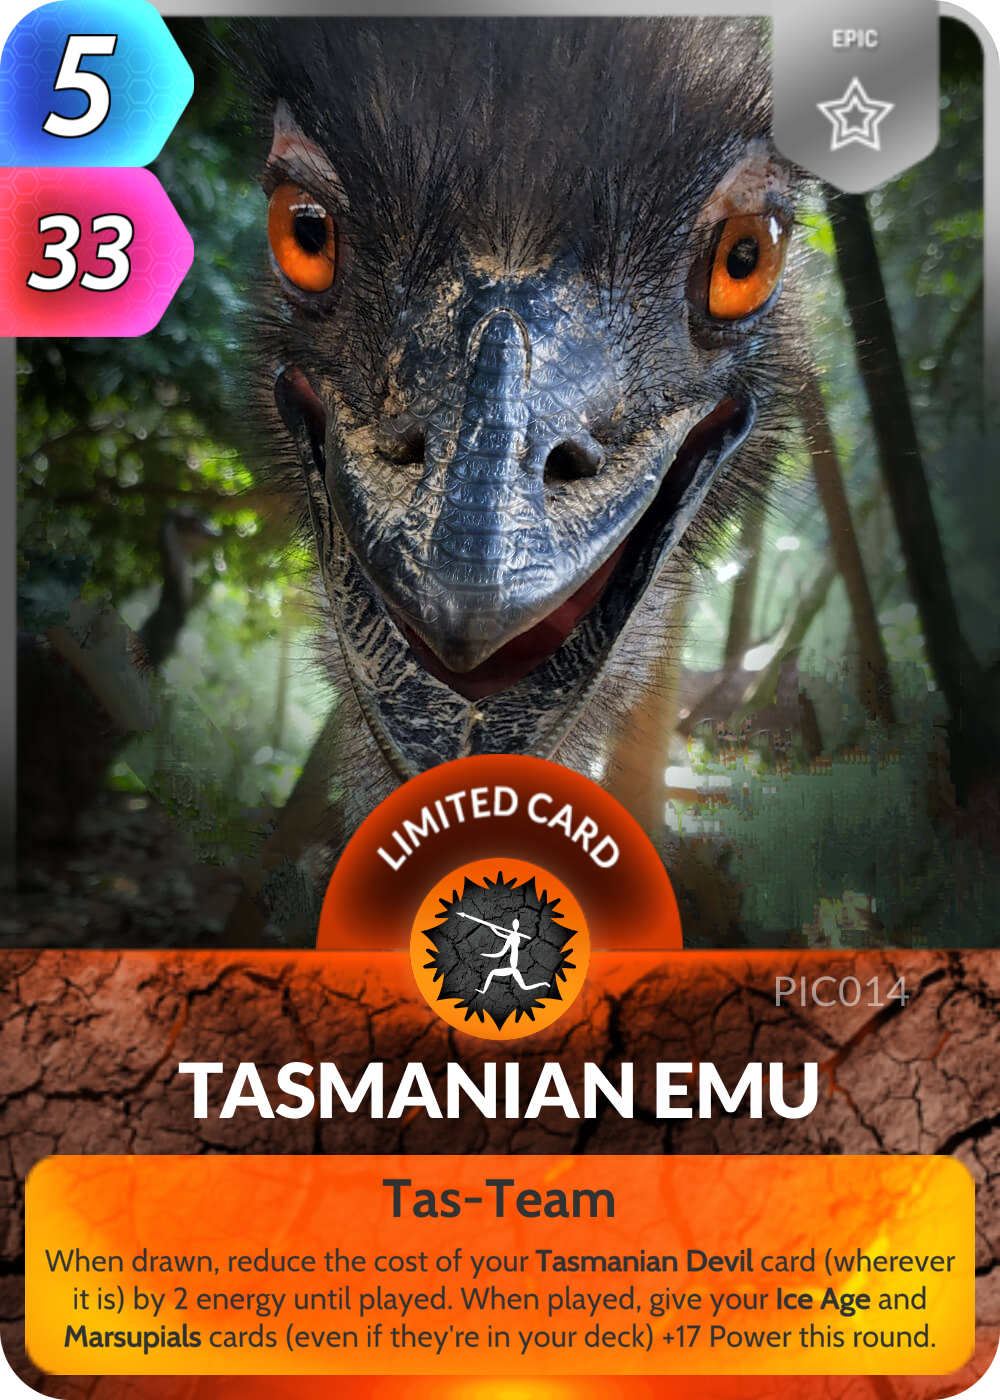 Tasmanian Emu